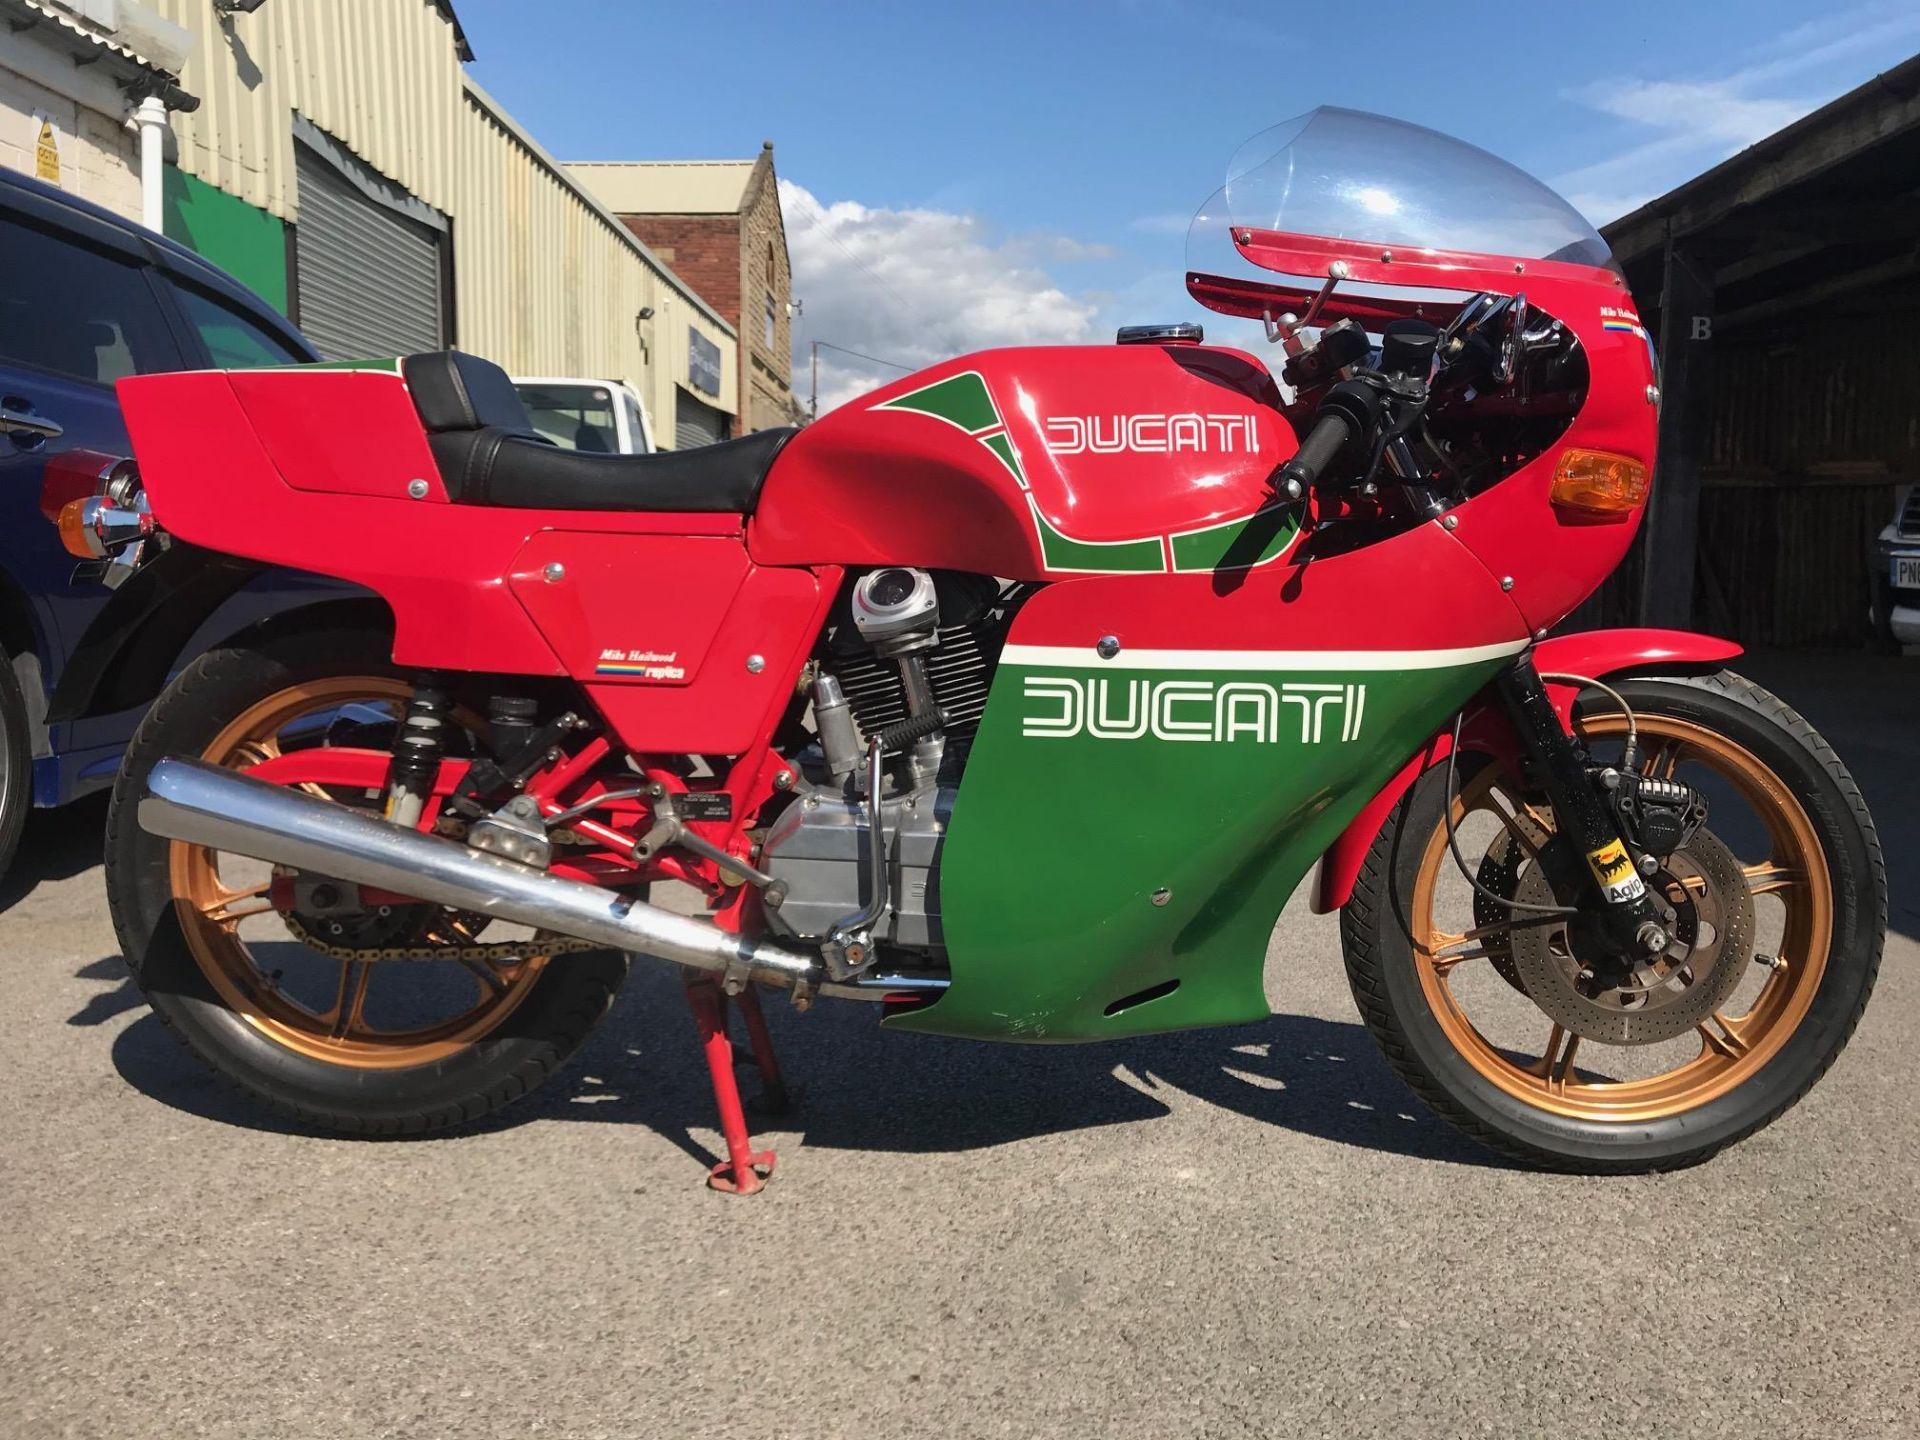 Lot 14 - 1982 Ducati MHR900